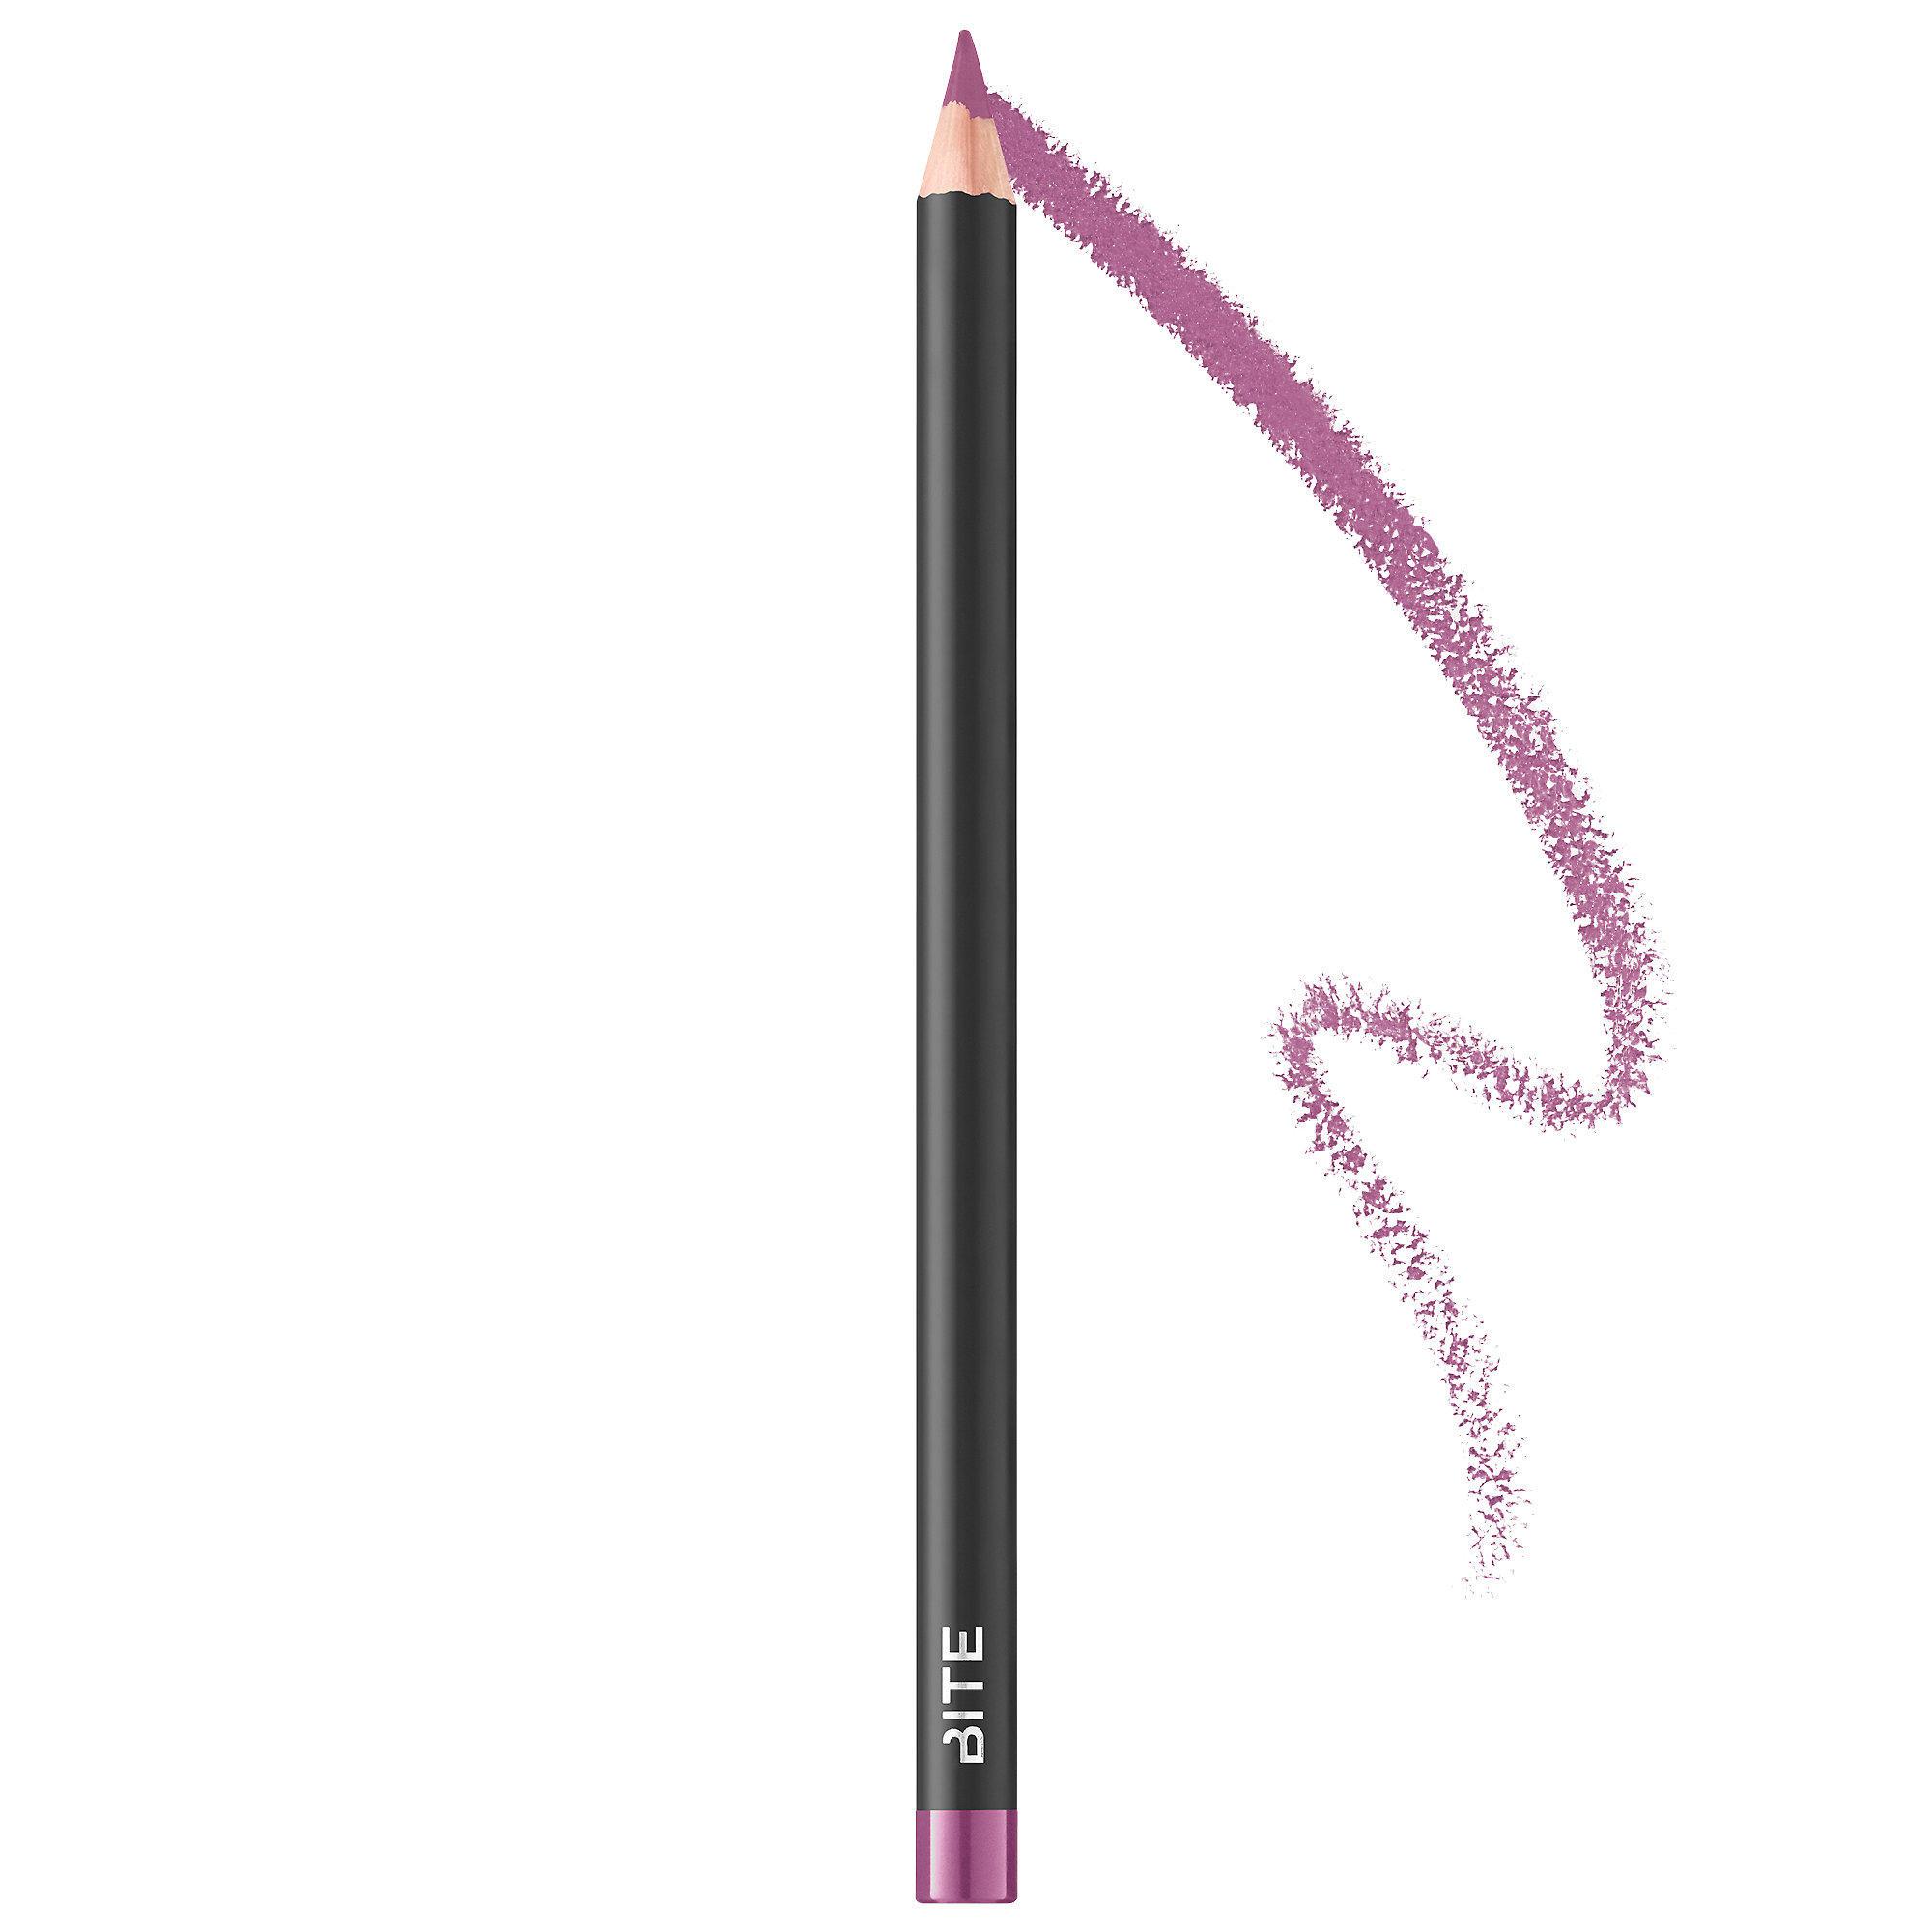 Bite Beauty The Lip Pencil 088